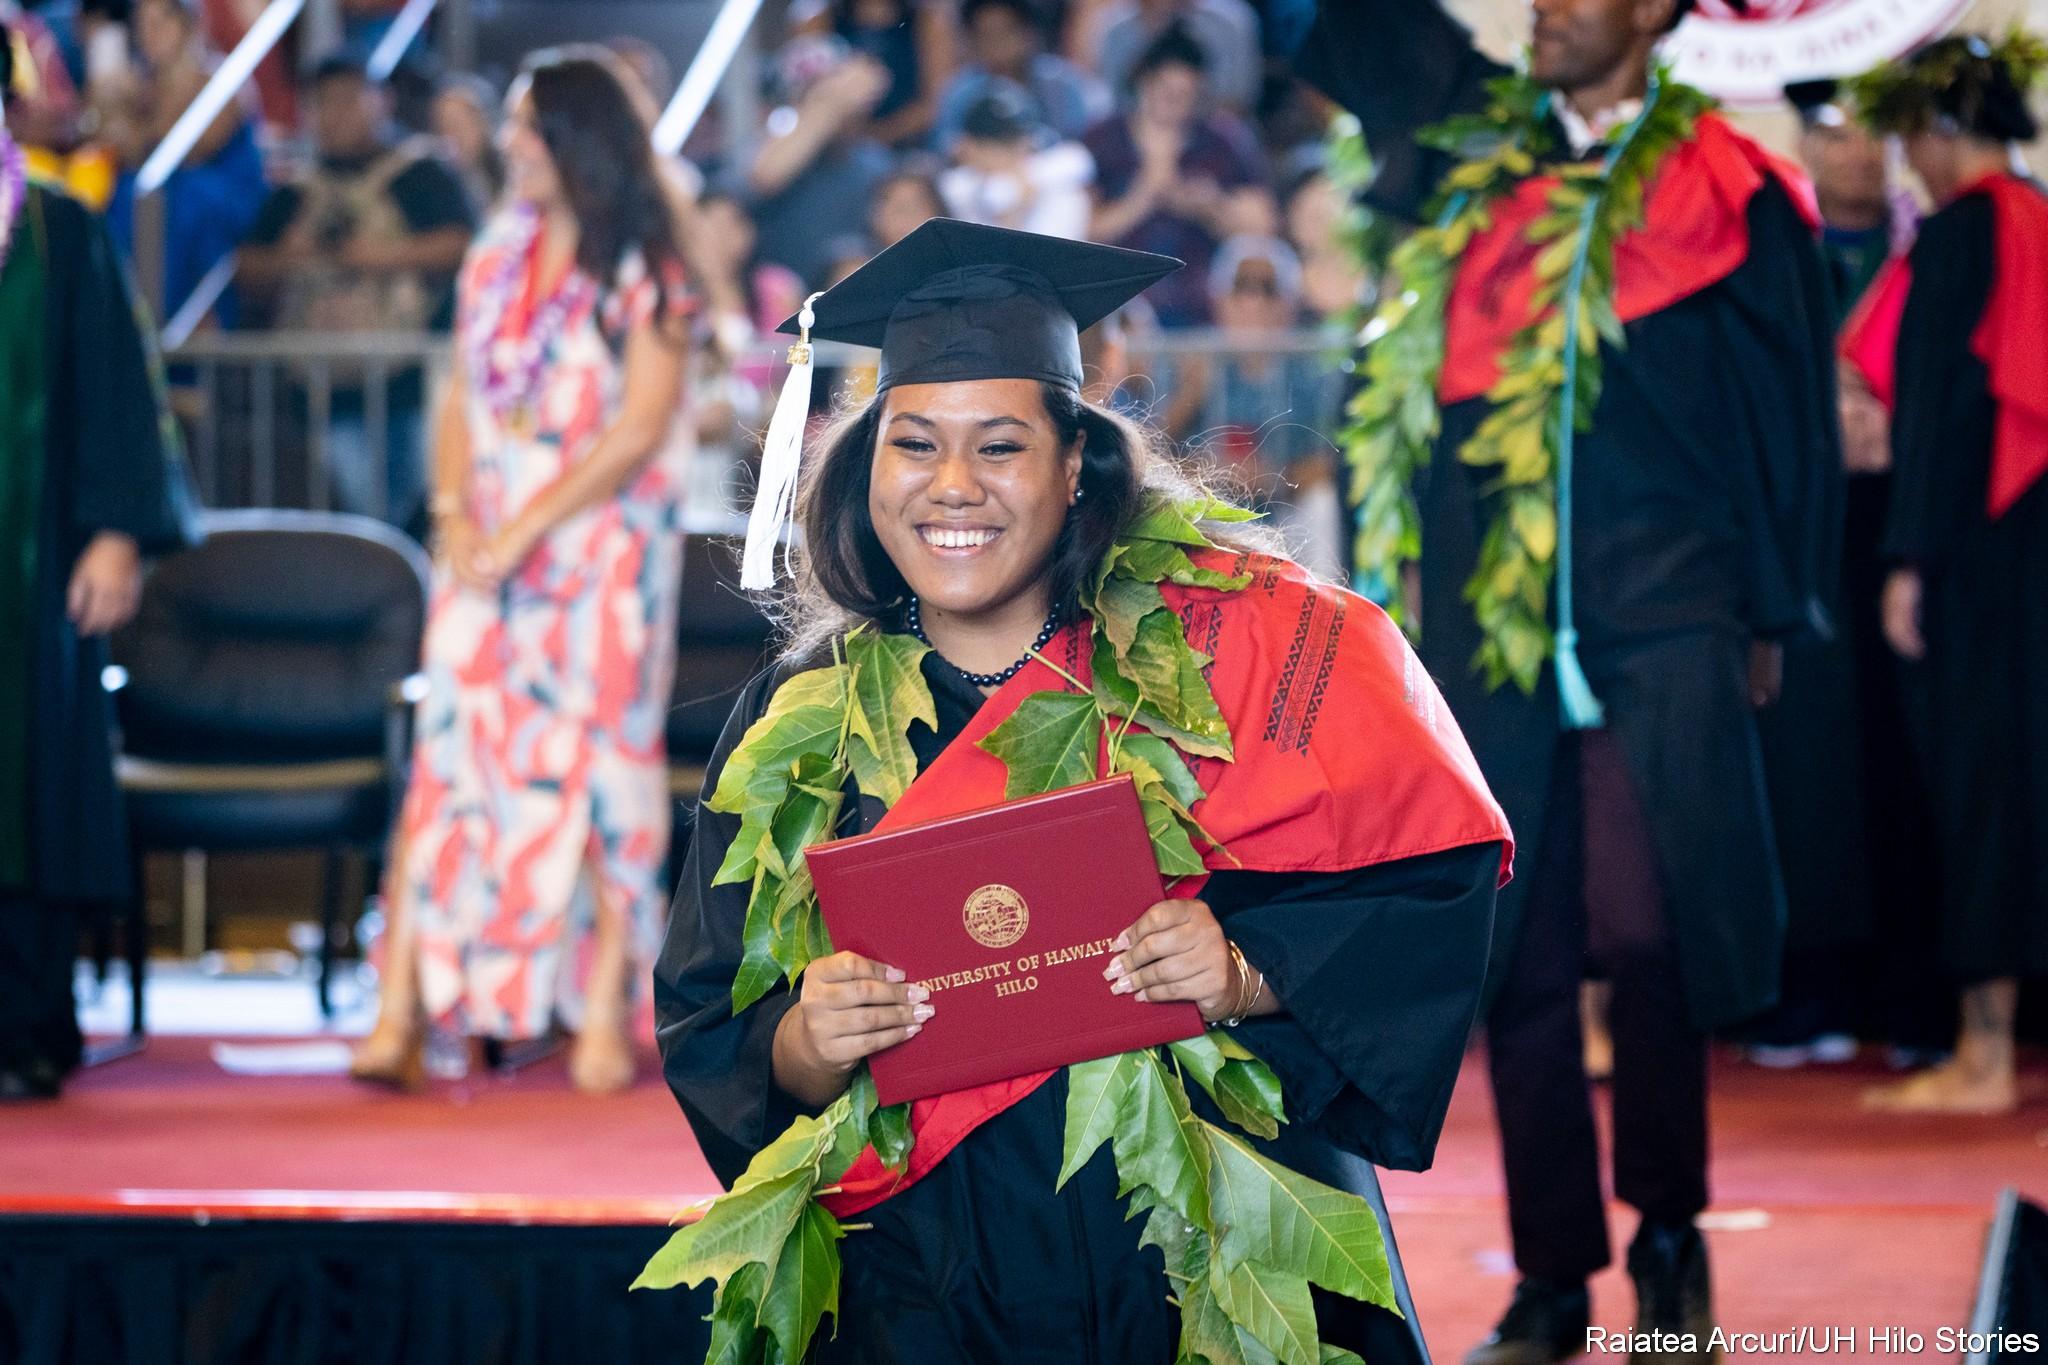 Big smile on female graduate leaving dais with diploma.